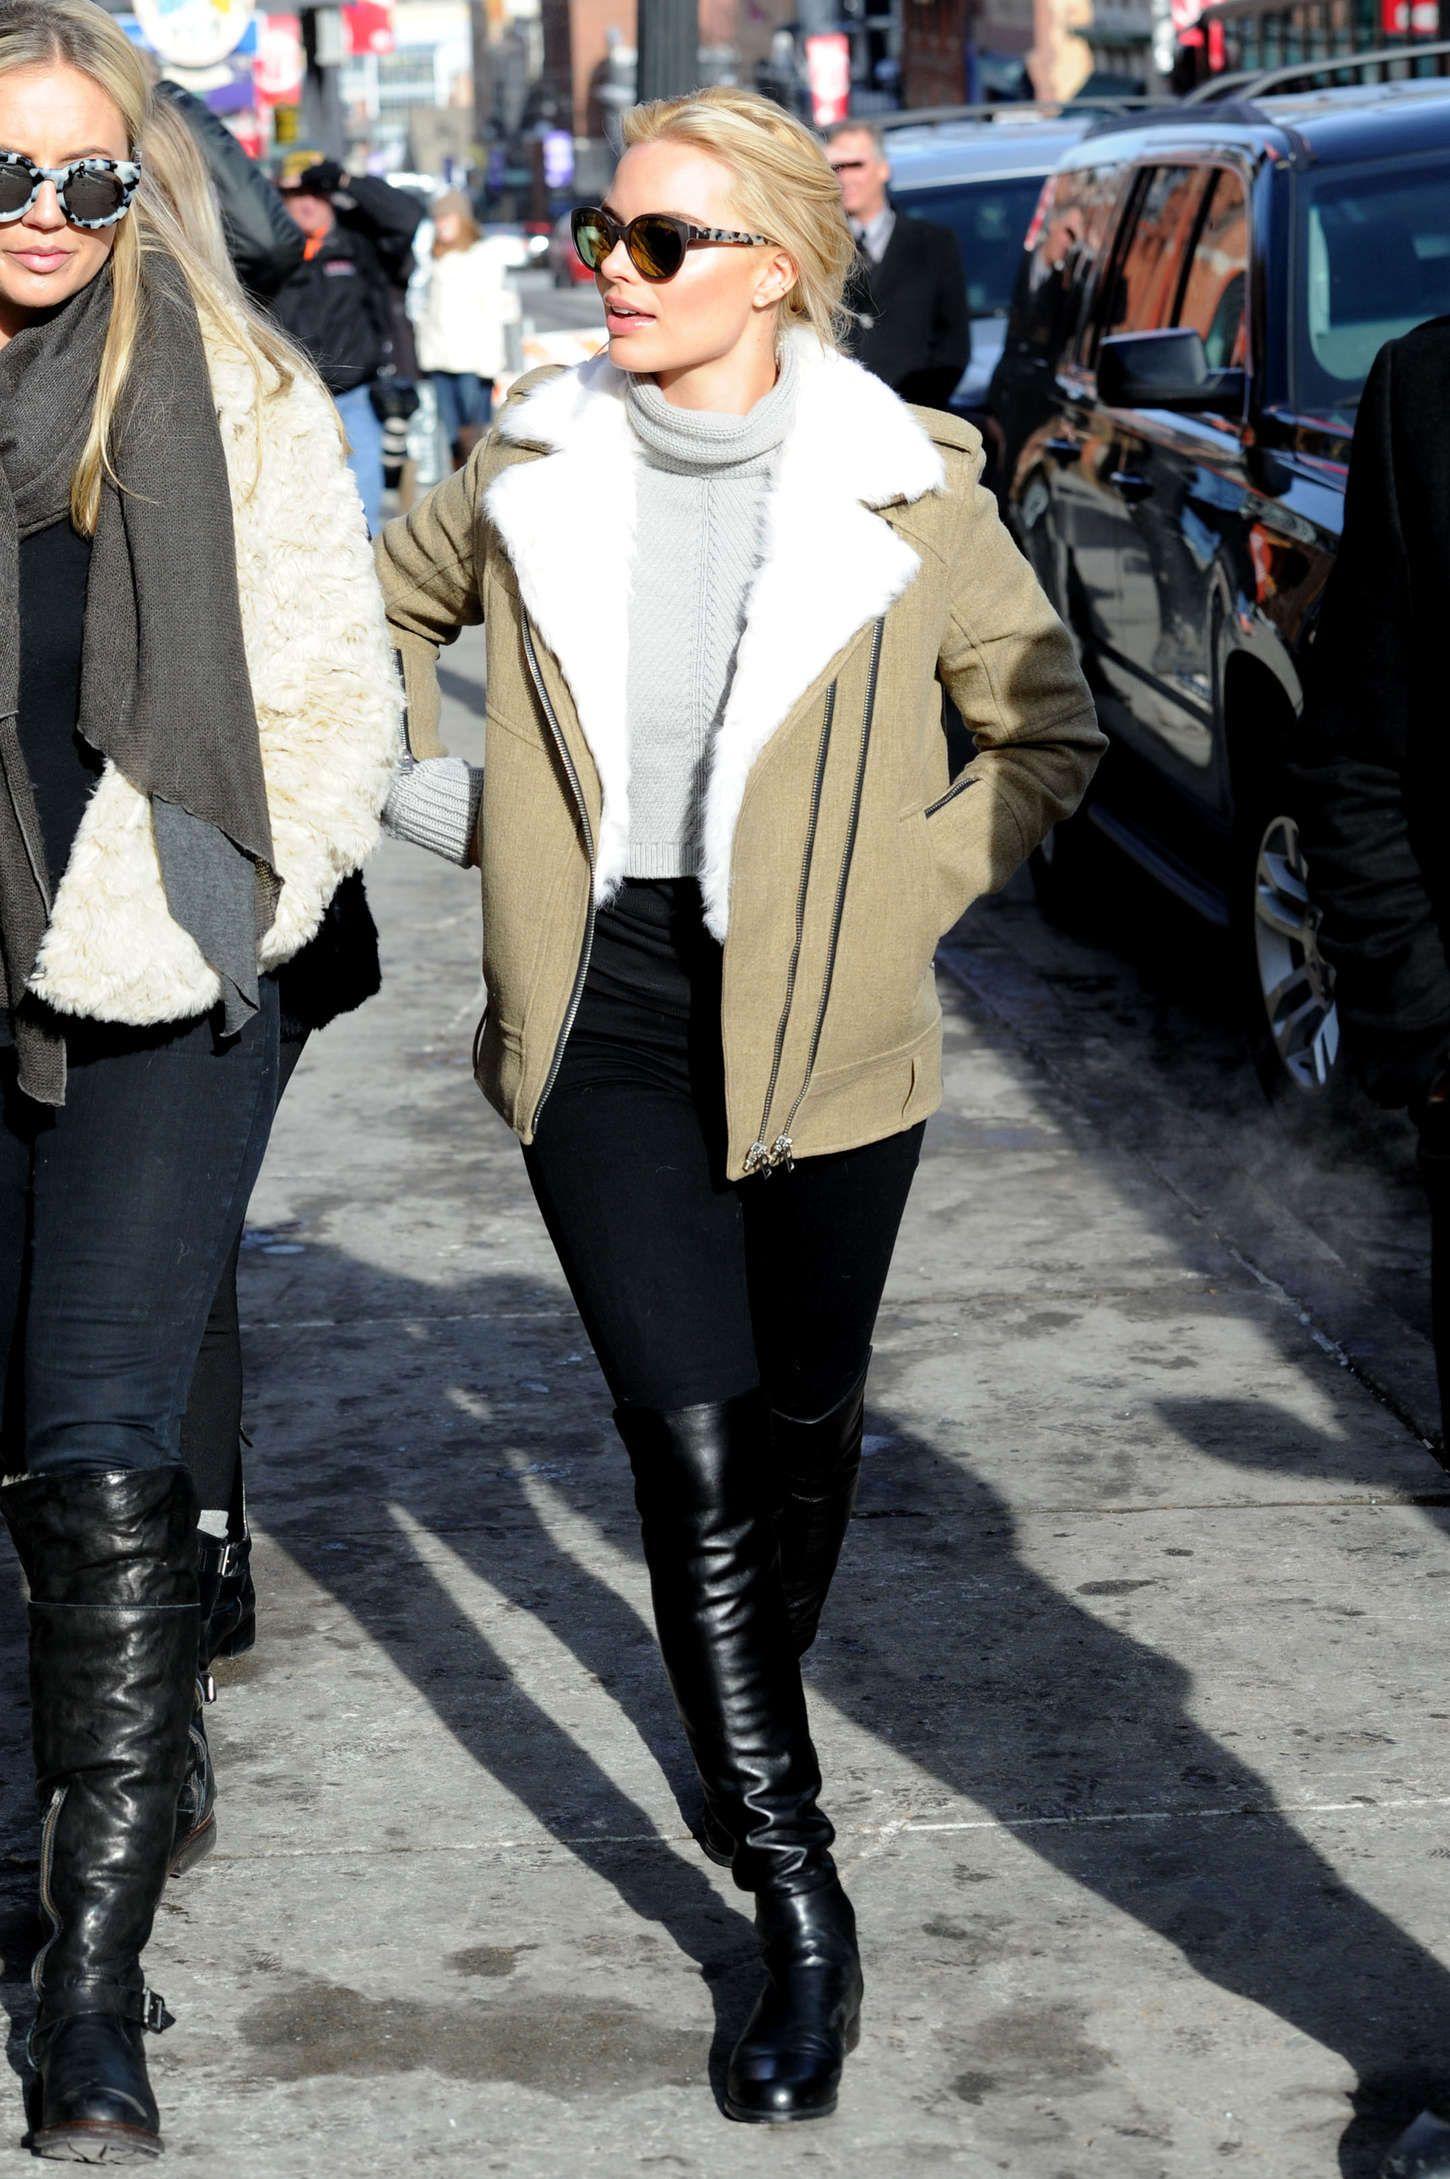 af90f9fd6f285 Margot Robbie. | Celebrity Style | Margot robbie style, Fashion ...